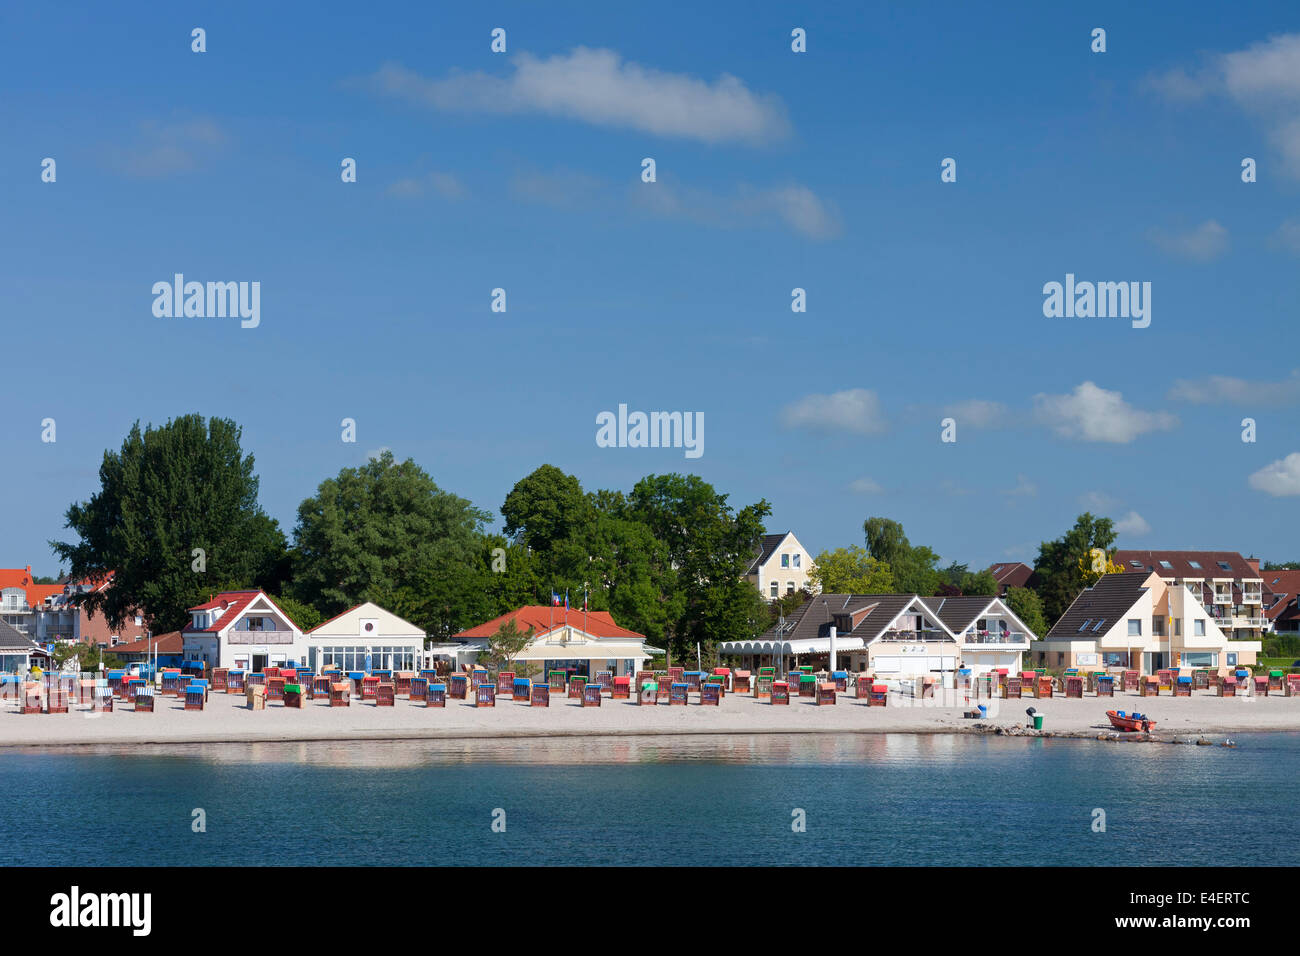 Roofed wicker beach chairs at Kellenhusen, seaside resort along the Baltic Sea , Schleswig-Holstein, Germany - Stock Image